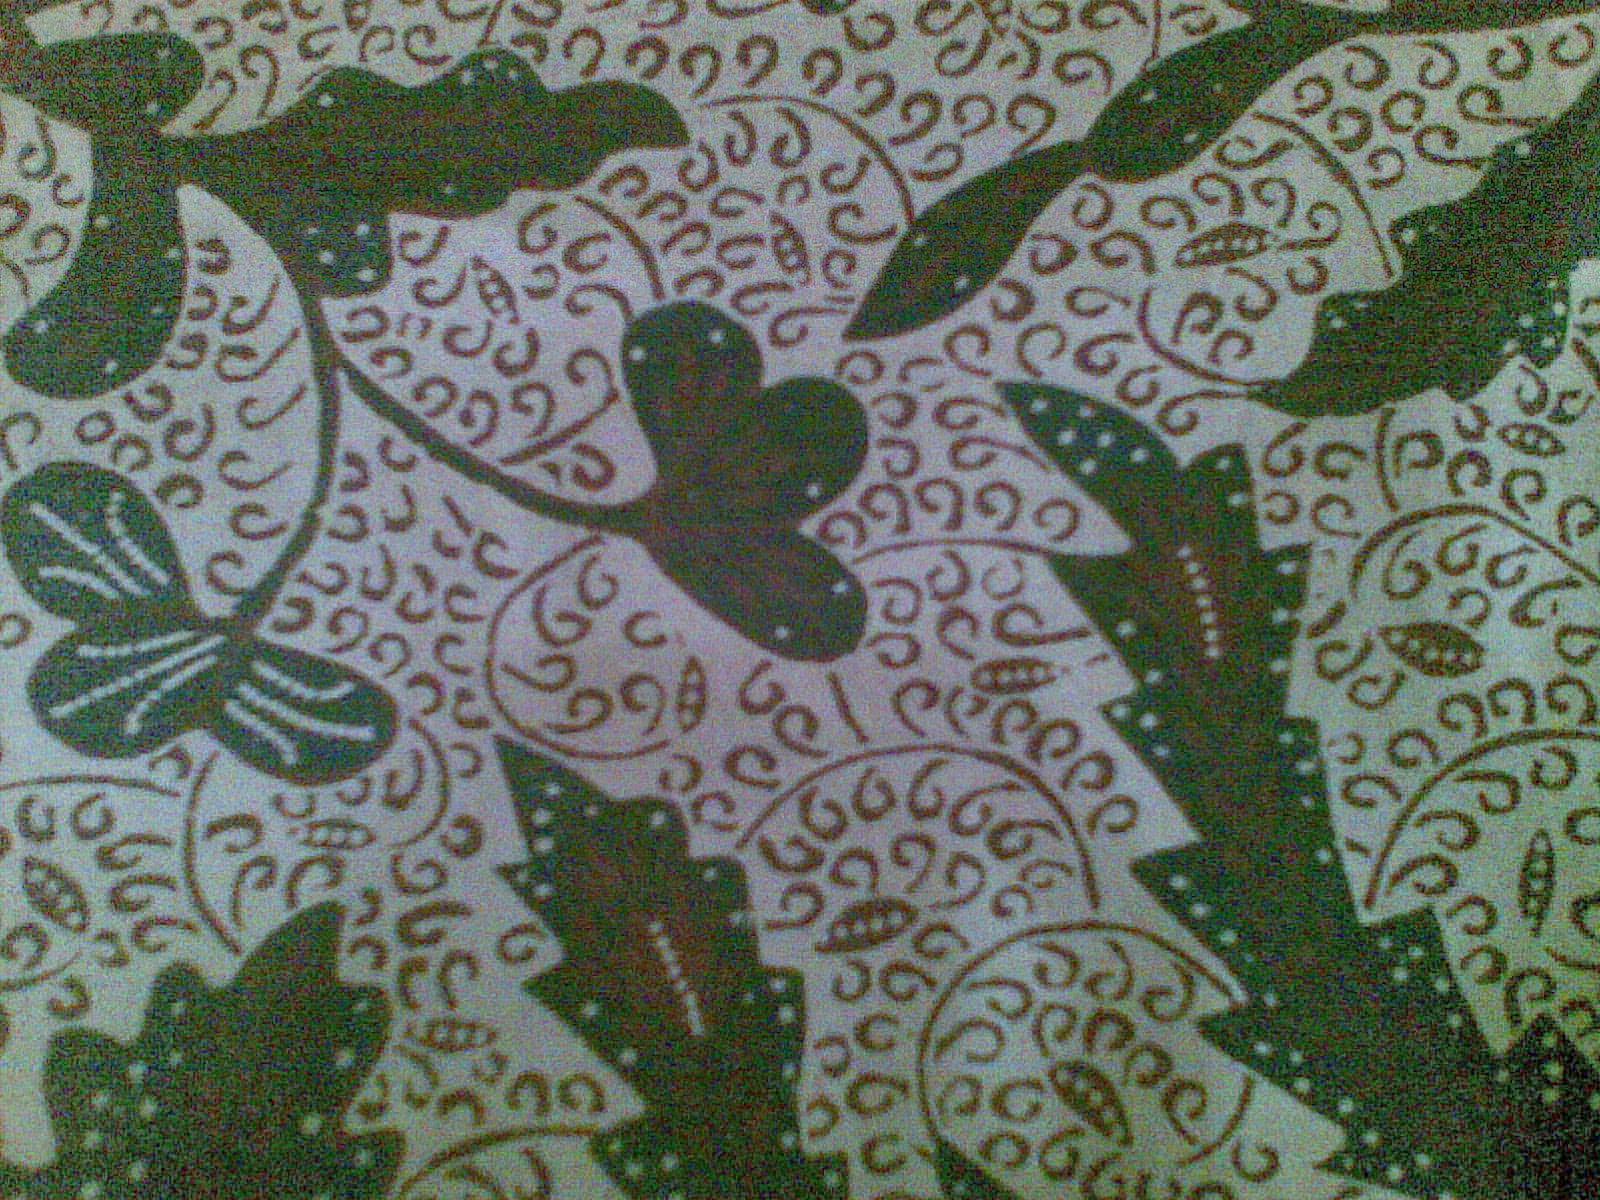 Contoh Gambar Batik Sd Contoh Diam